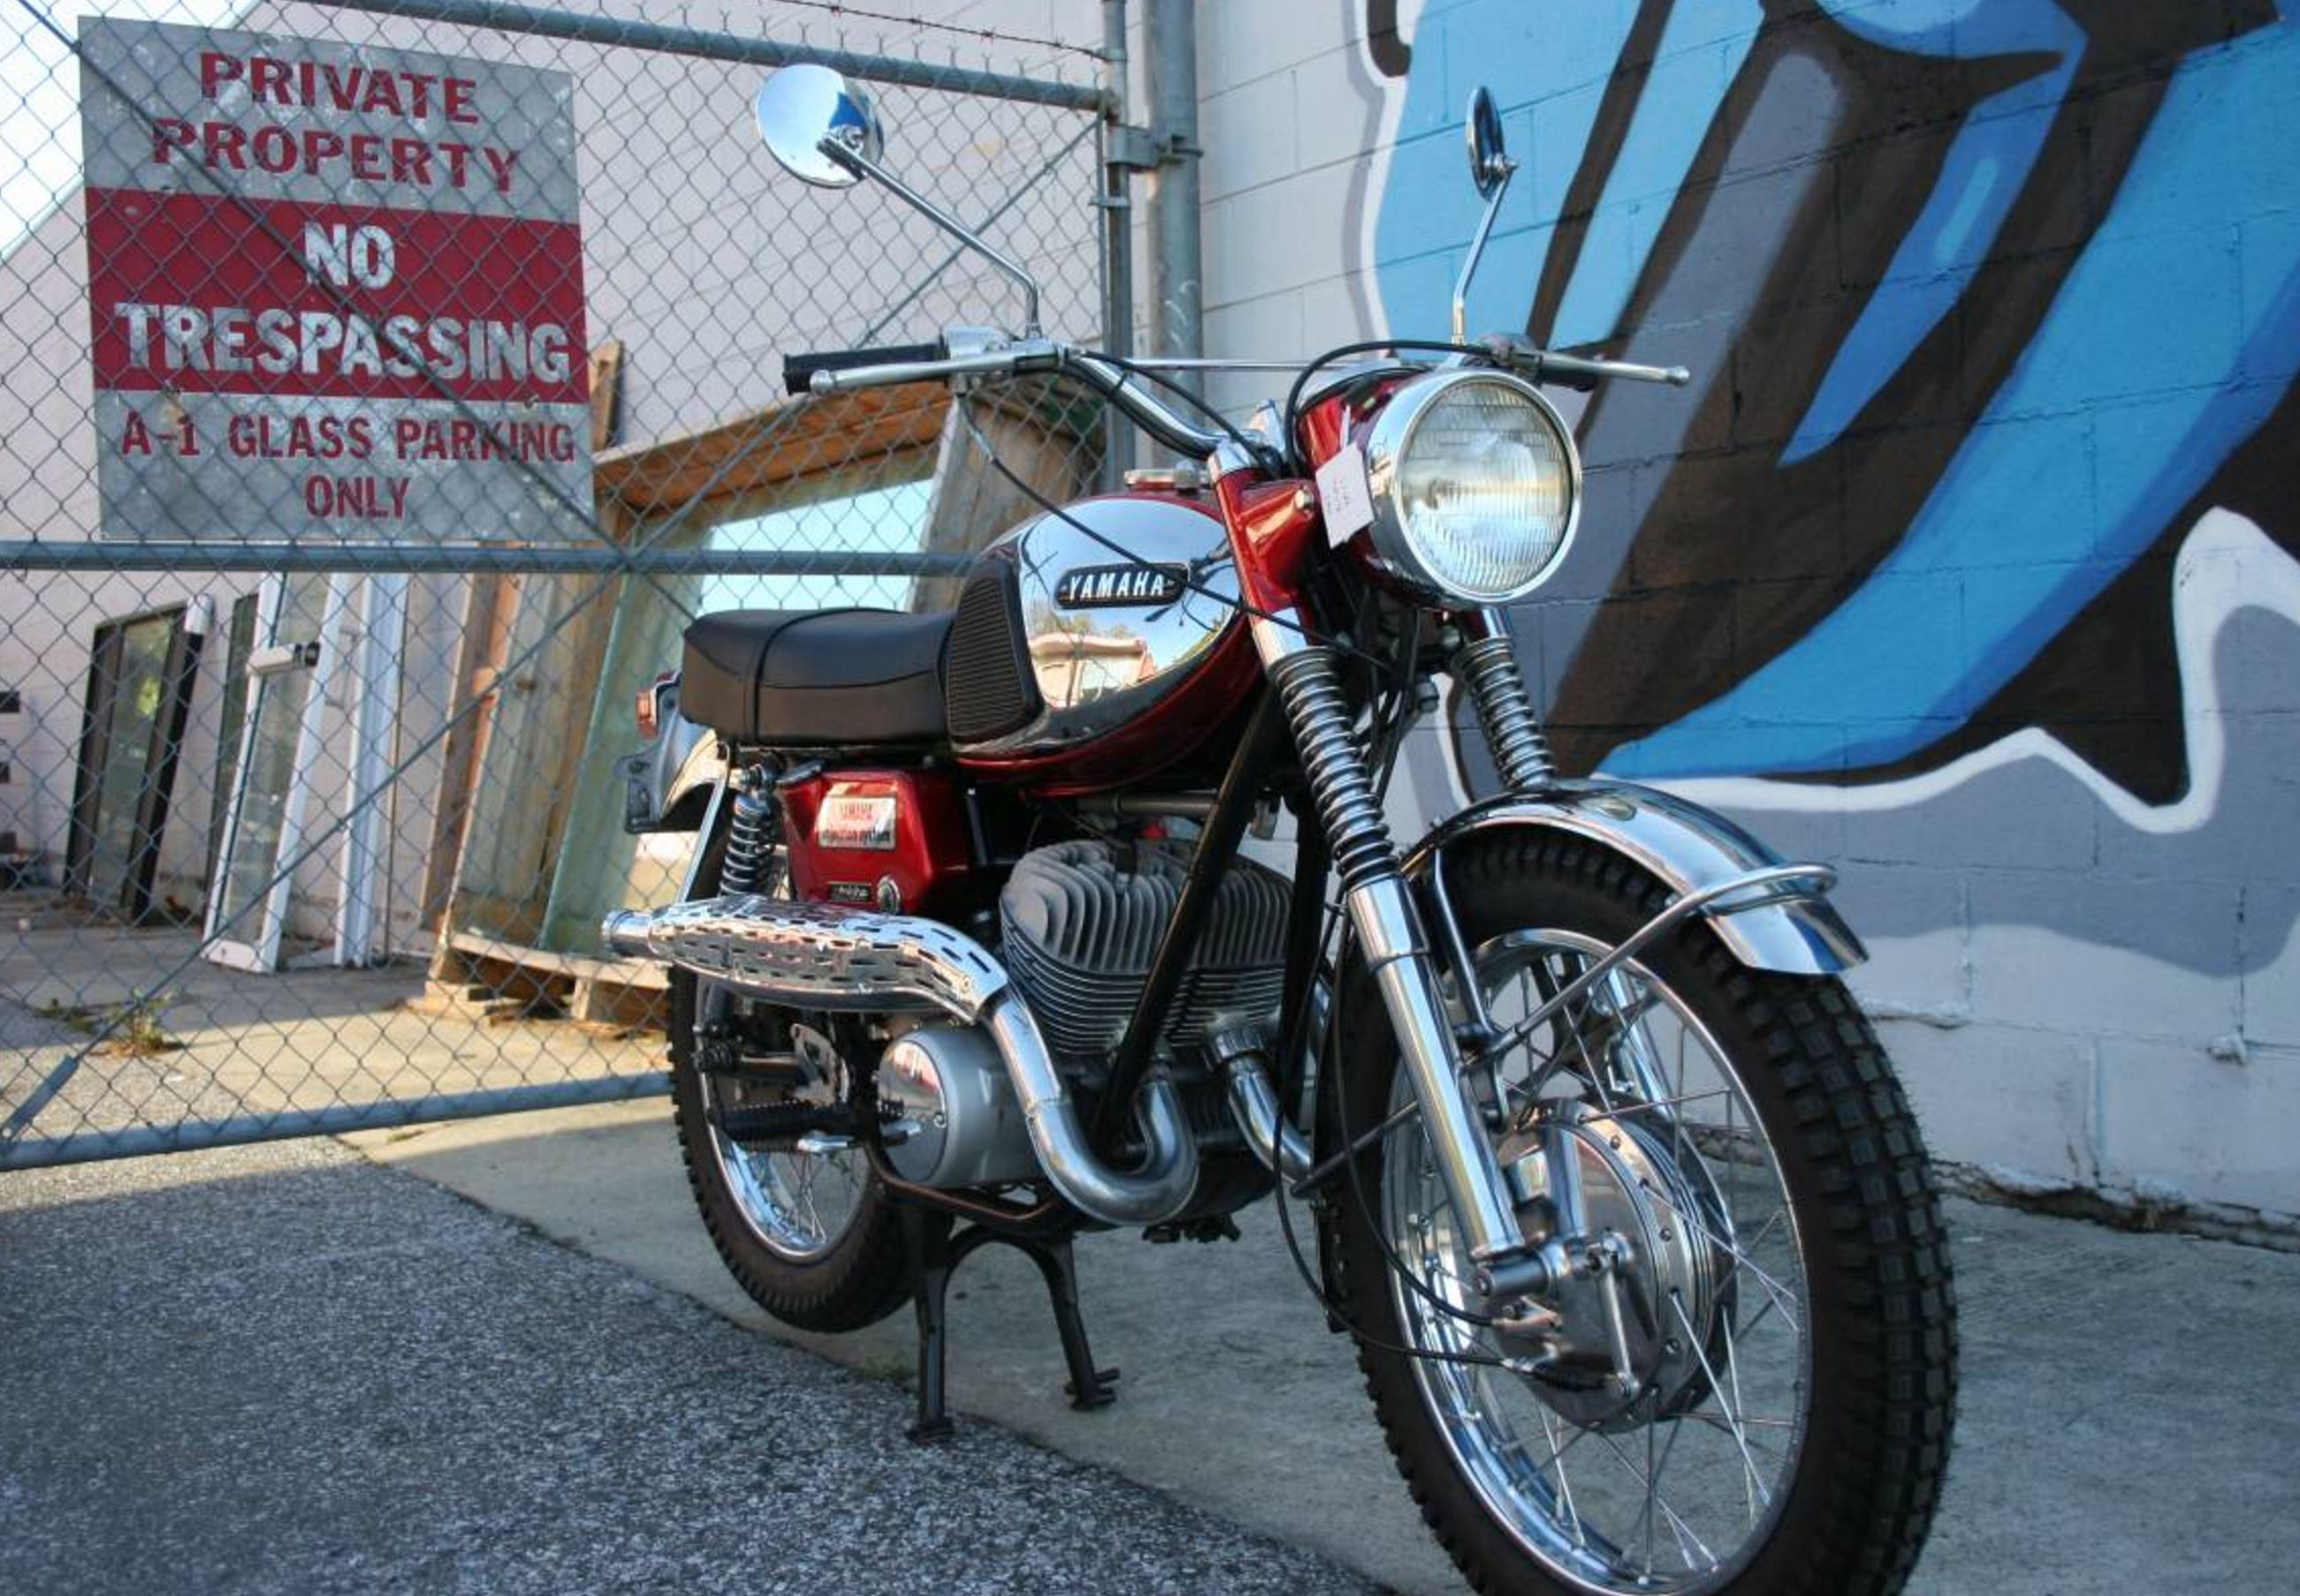 1967 yamaha big bear 305 scrambler bike urious honda 305 motorcycle 305 scrambler wiring diagram #21